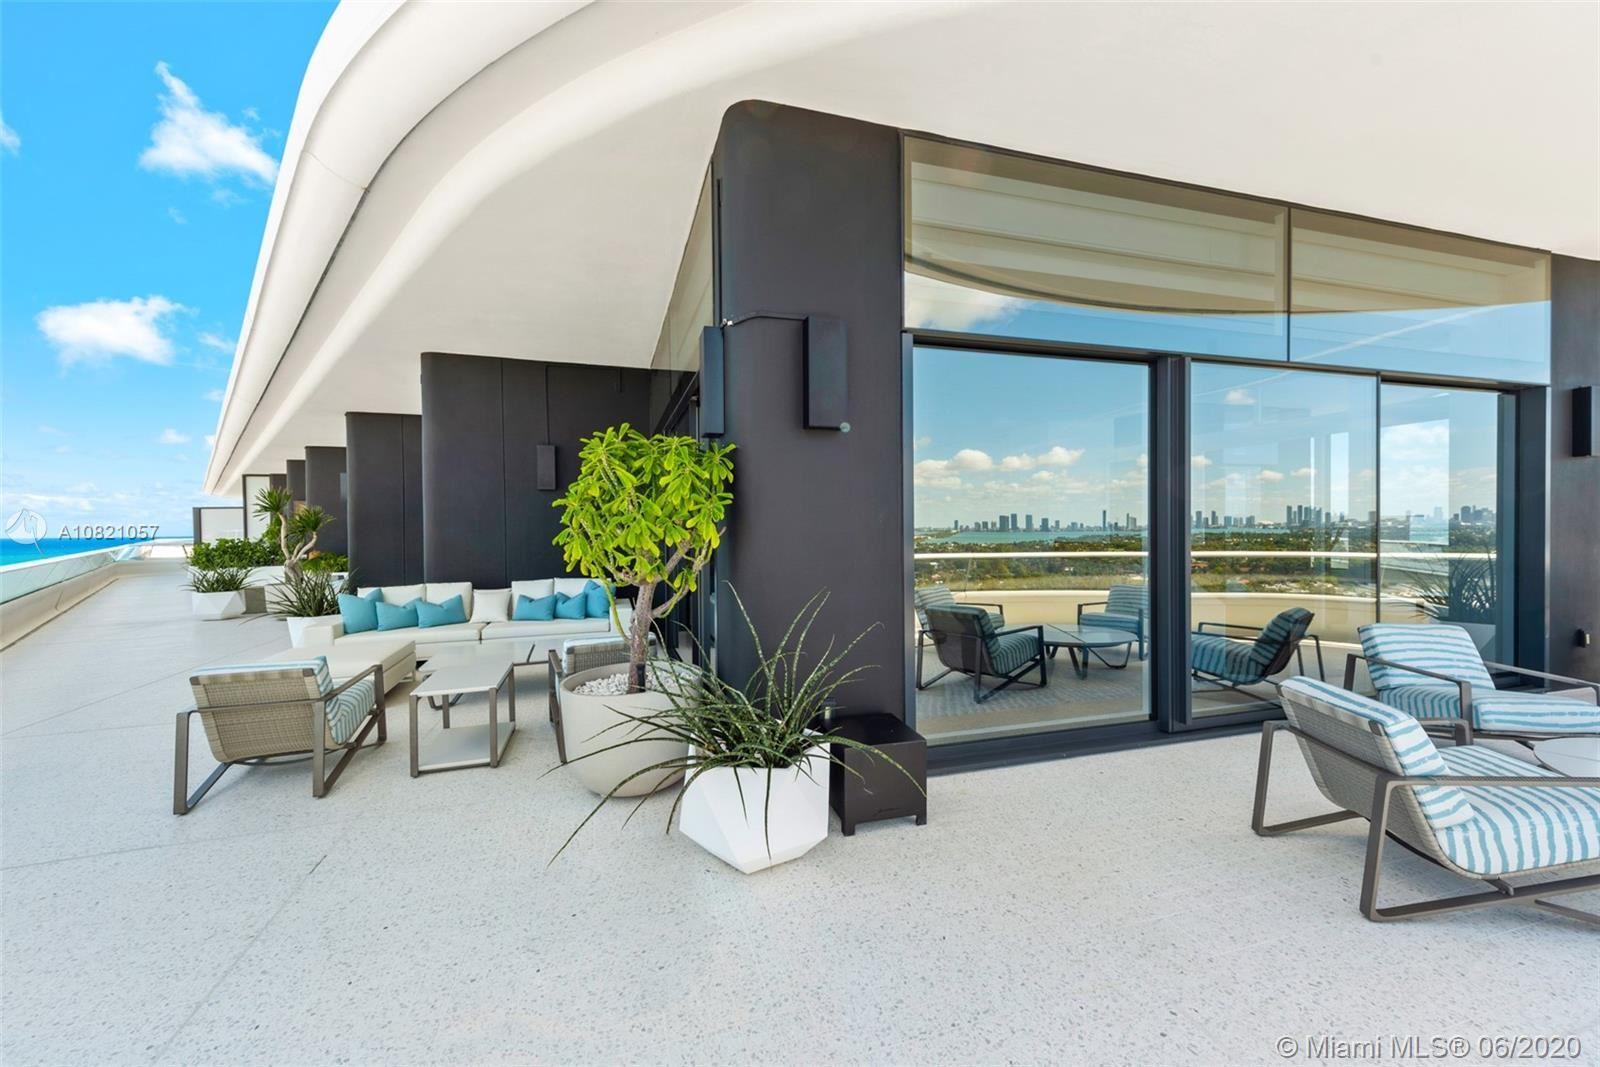 Photo 8 of Listing MLS a10821057 in 3315 Collins Ave #PH-B Miami Beach FL 33140